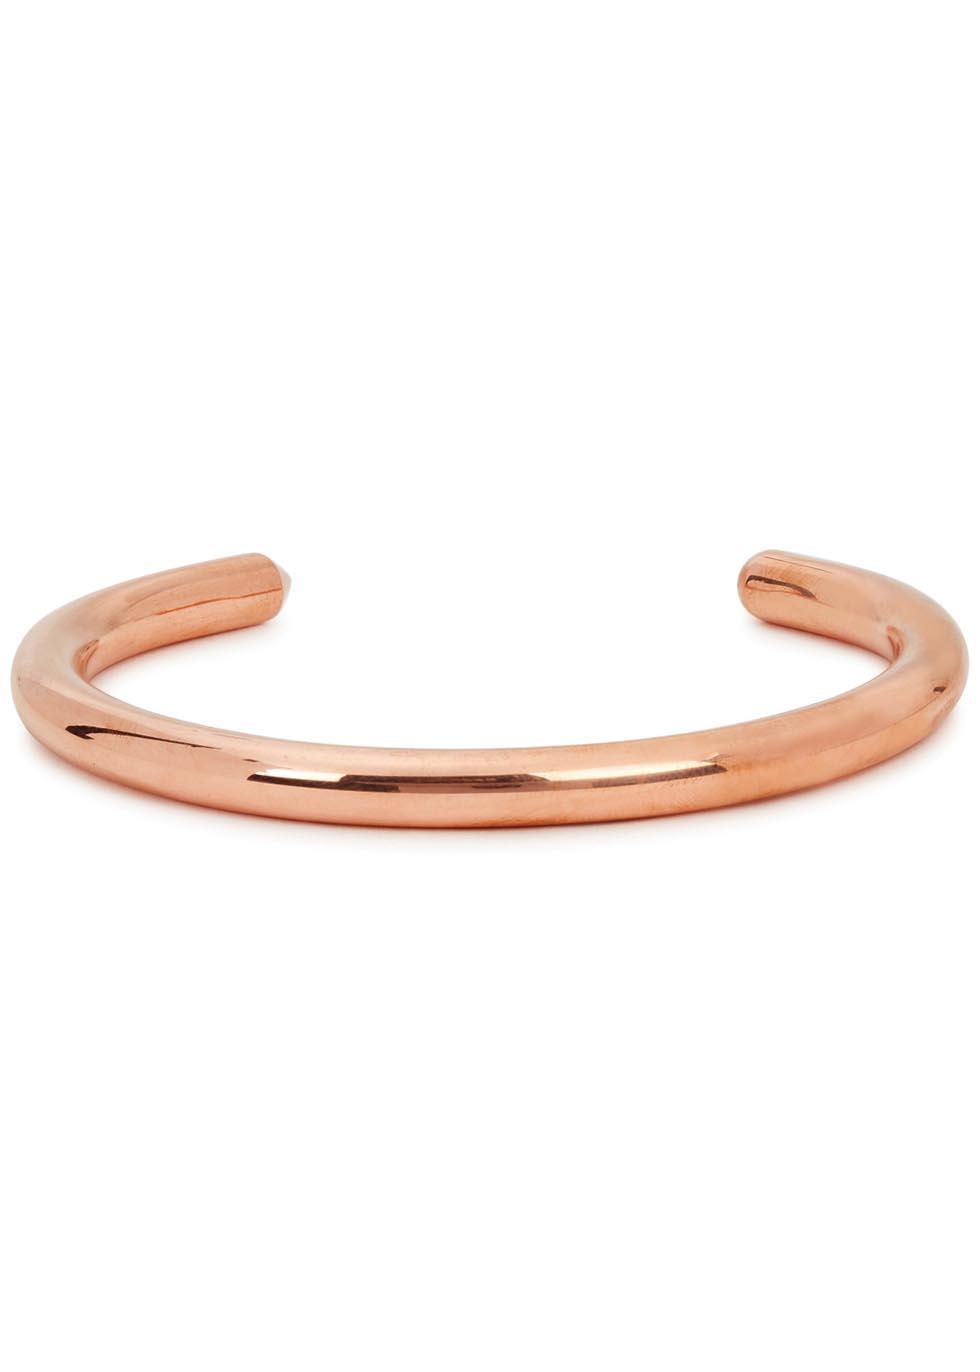 Maxwell copper cuff - Alice Made This